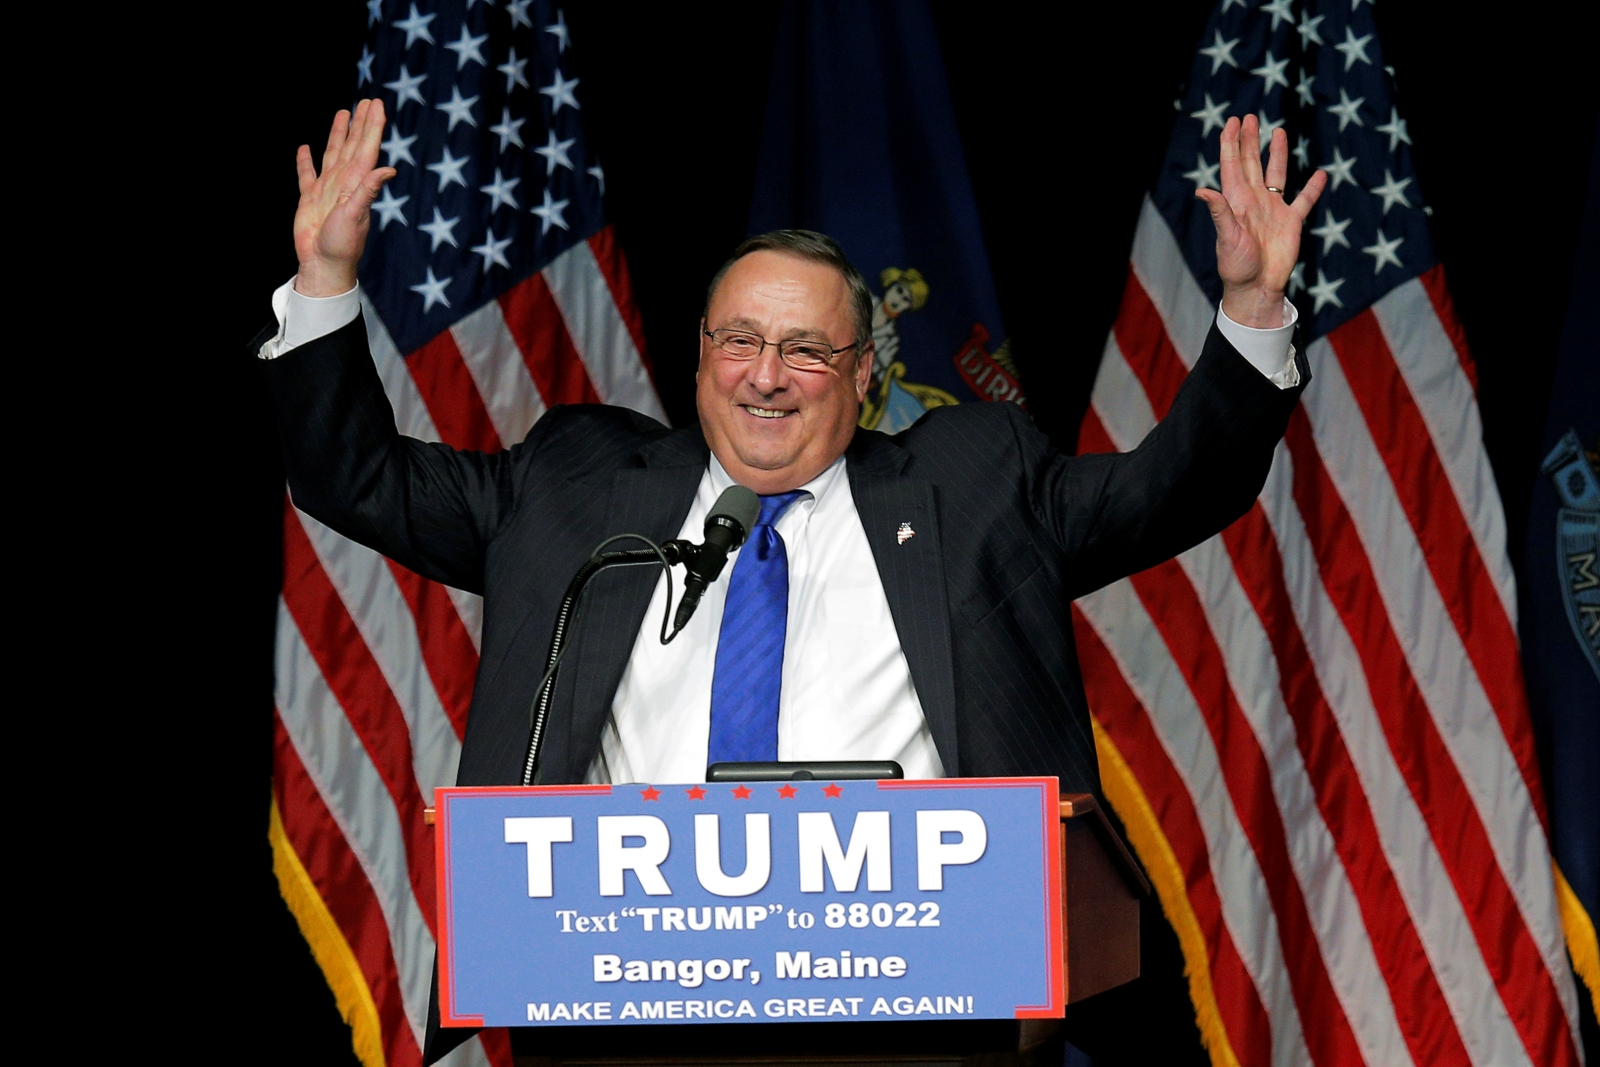 Maine Governor Paul LePage